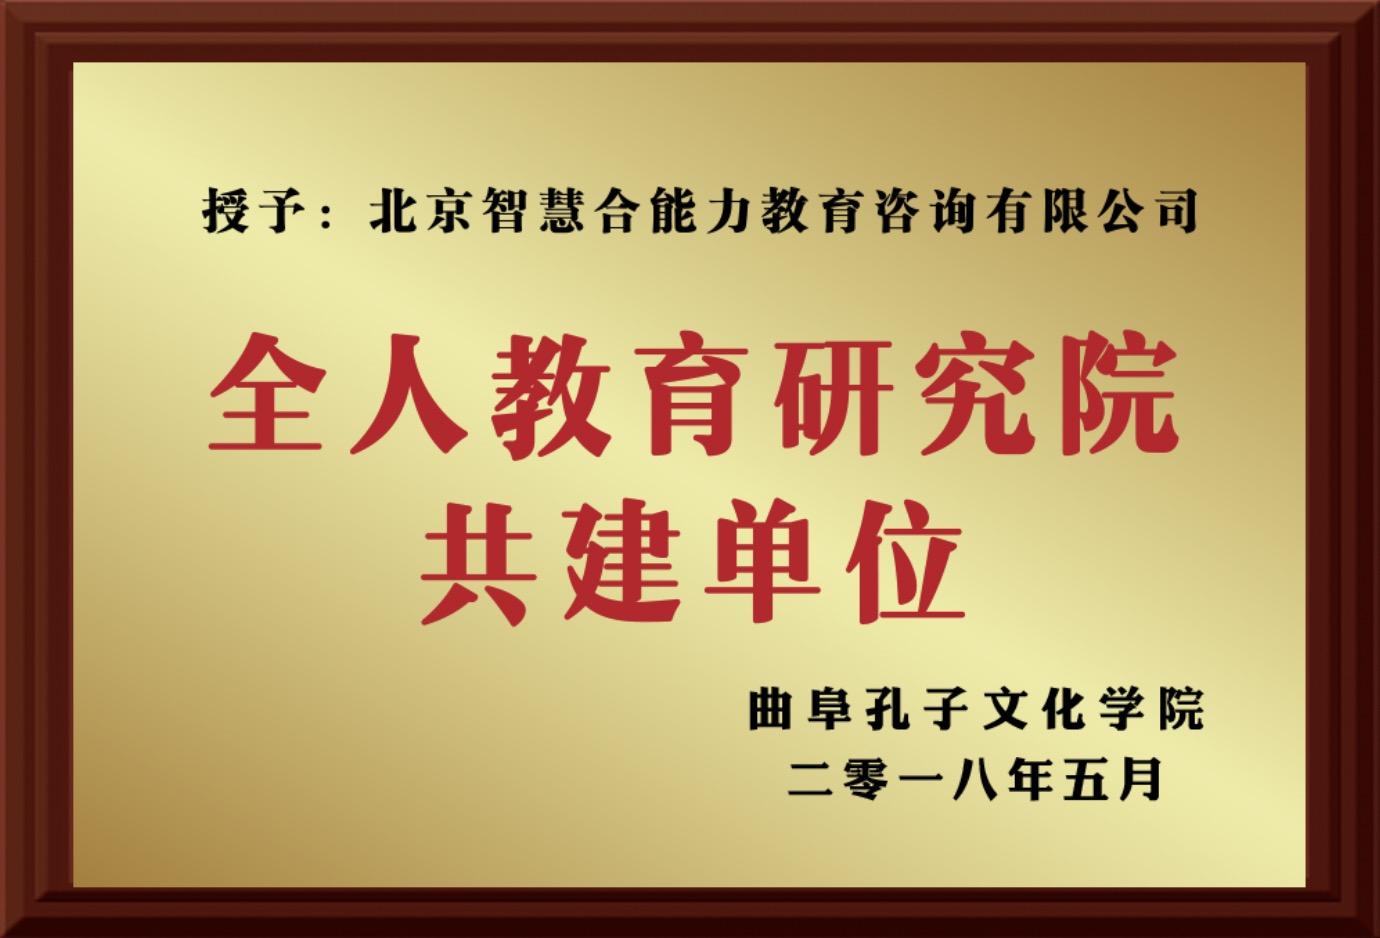 "<span style=""font-size:14px;color:#FFFFFF;"">曲阜孔子文化学院授予北京智慧合能力教育咨询有限公司全人教育研究院共建单位</span>"